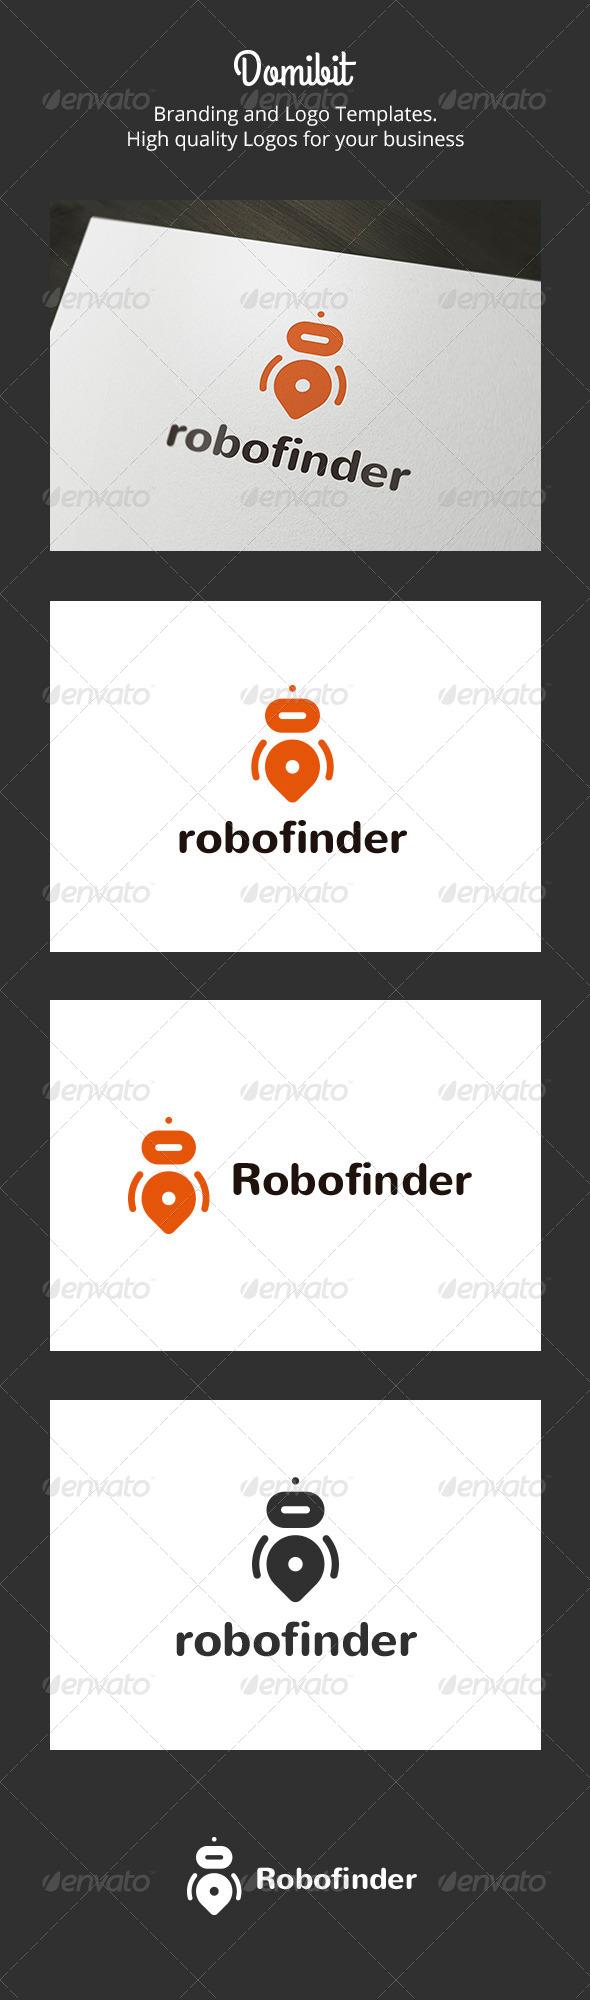 Robofinder - Robot Finder Logo - Objects Logo Templates